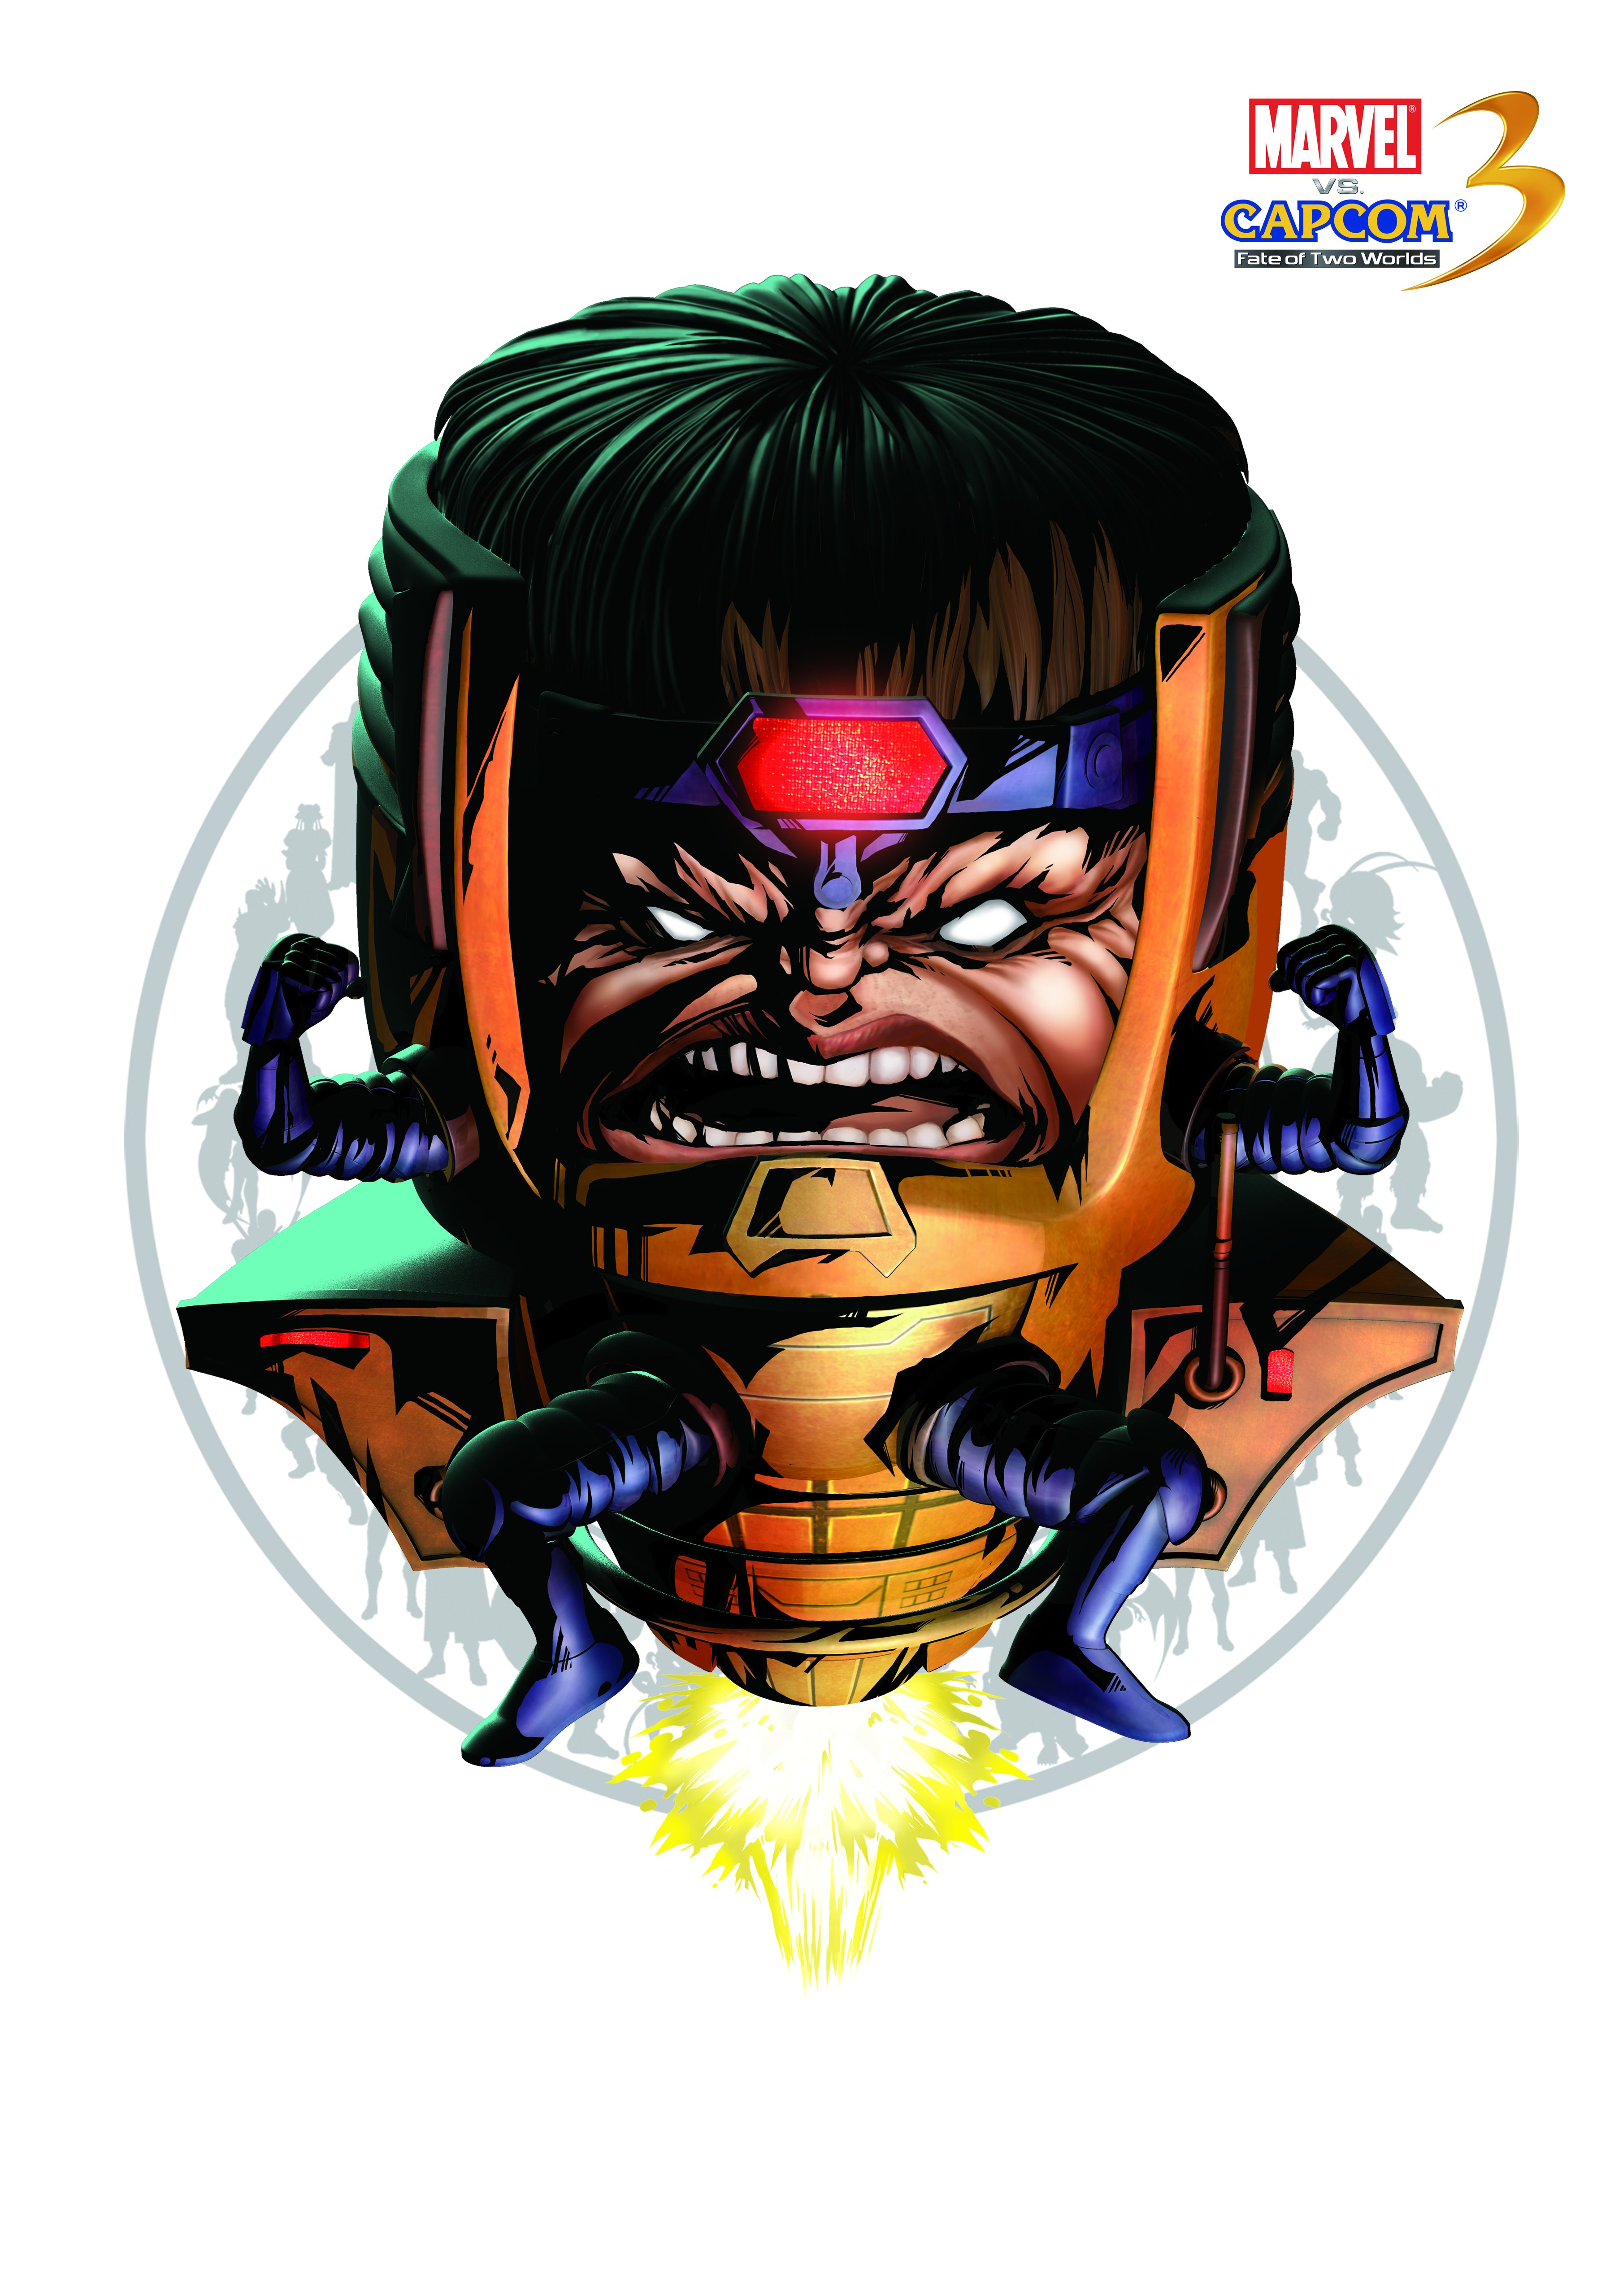 М. О. Д. О. К. - Marvel vs. Capcom 3: Fate of Two Worlds Арт, Персонаж